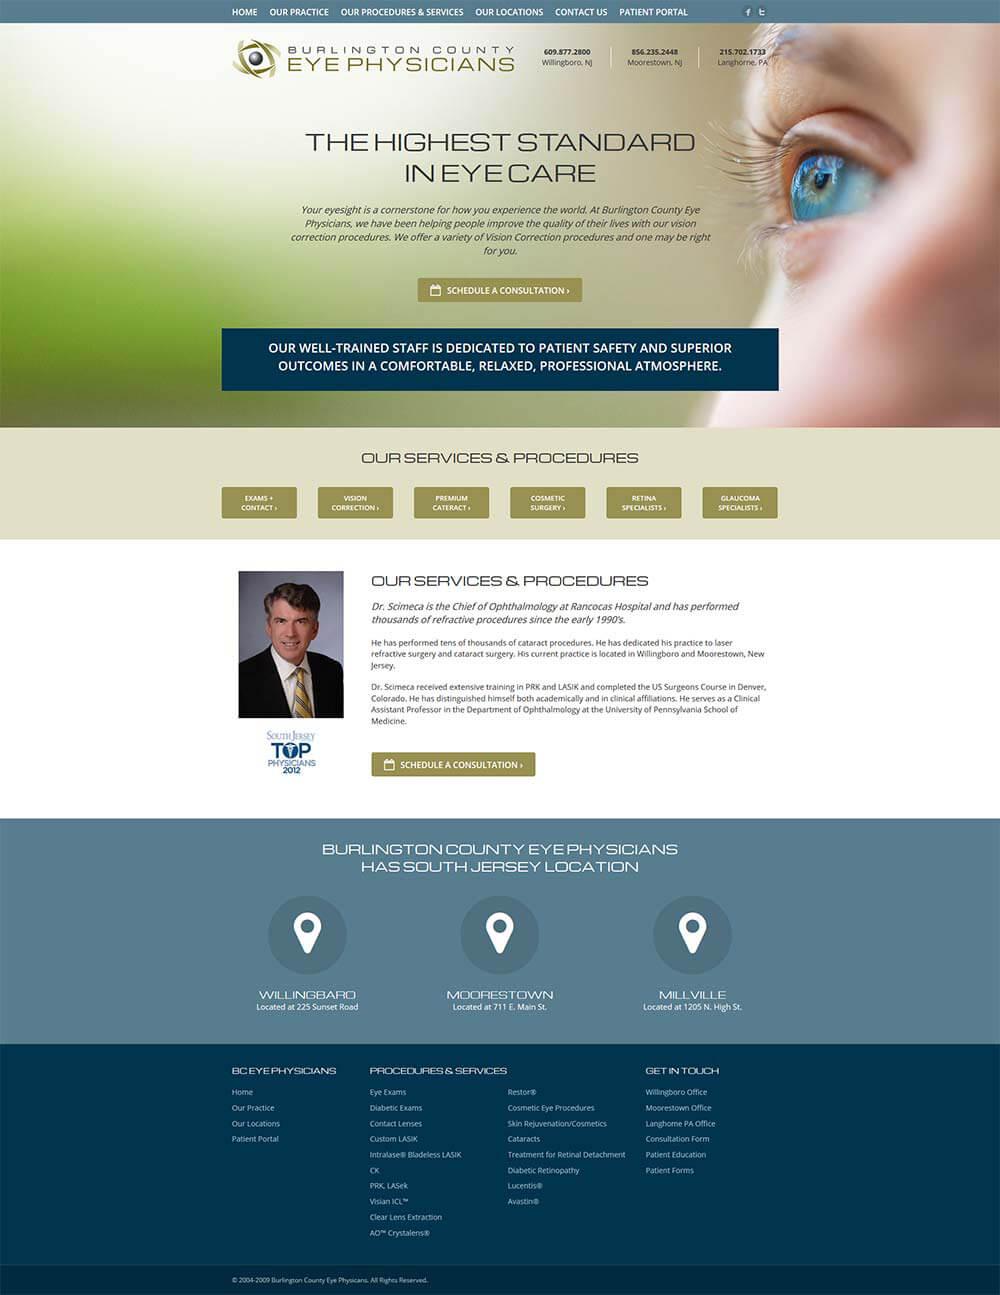 Burlington-County-Eye-Physicians-2015-08-31-11-40-56